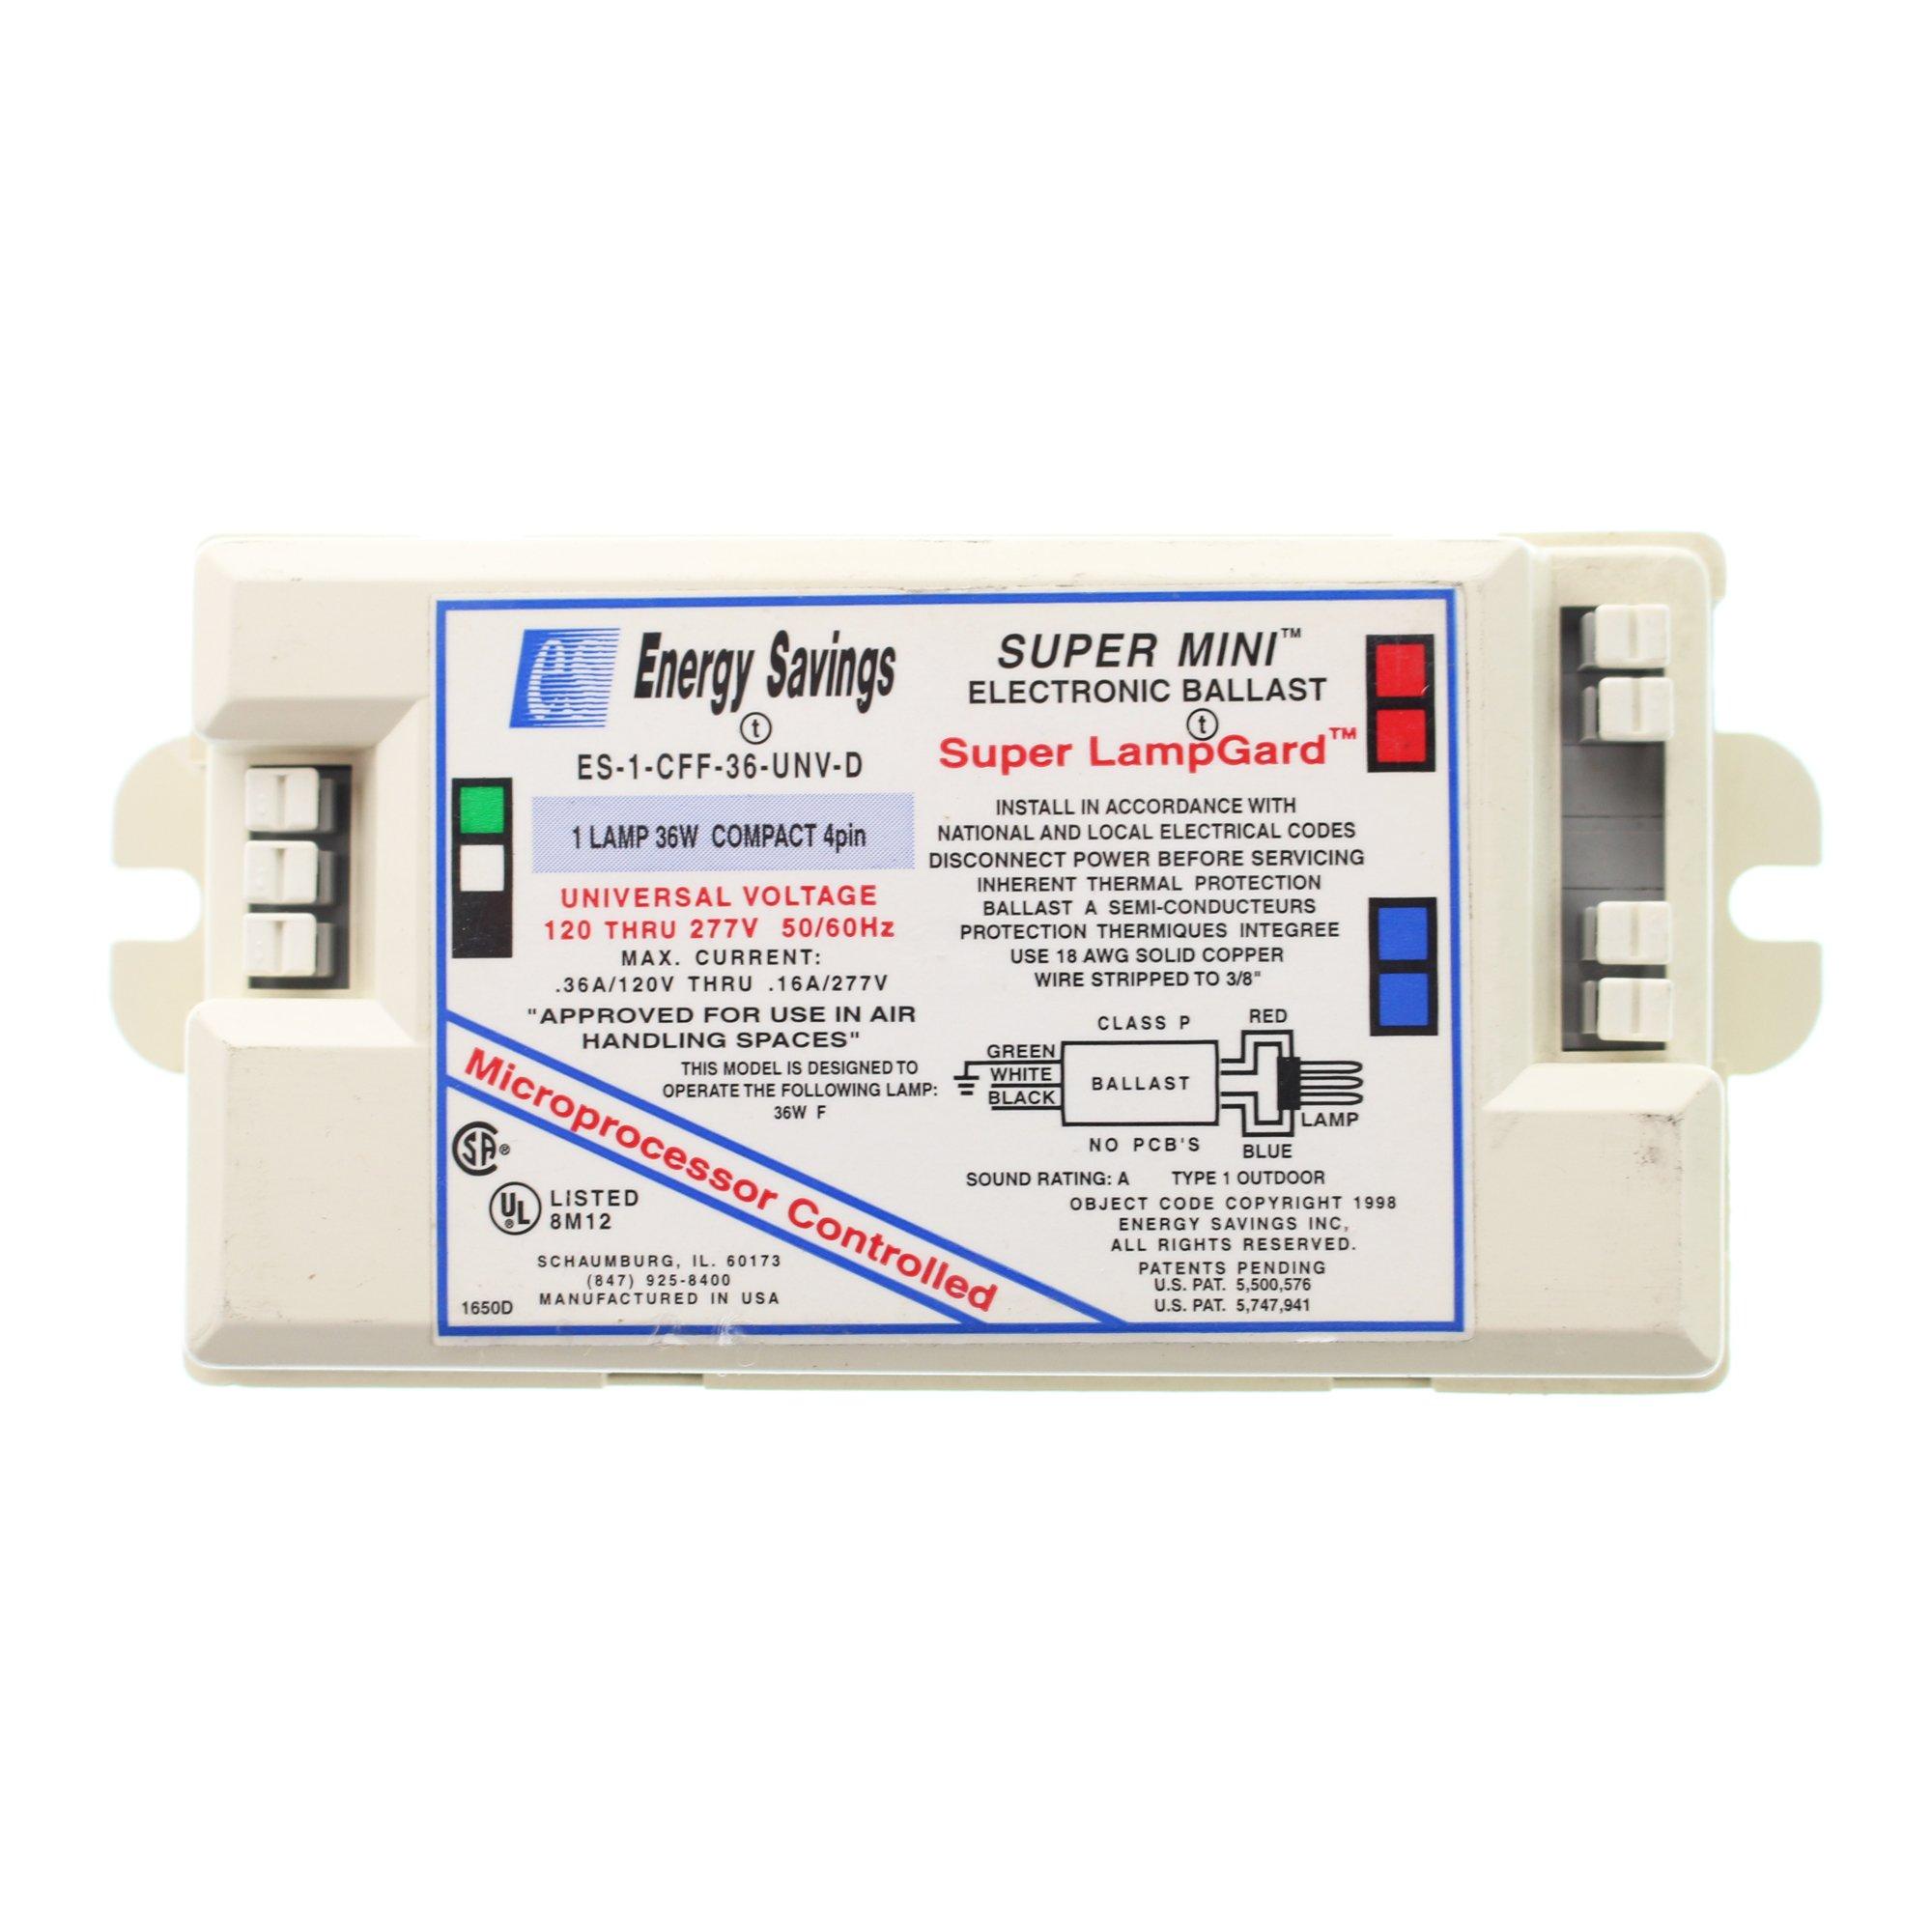 Energy Savings Es-1-CFF-36-UNV-D Electronic CFL Ballast, (1) 36W 4-Pin, 120/277V